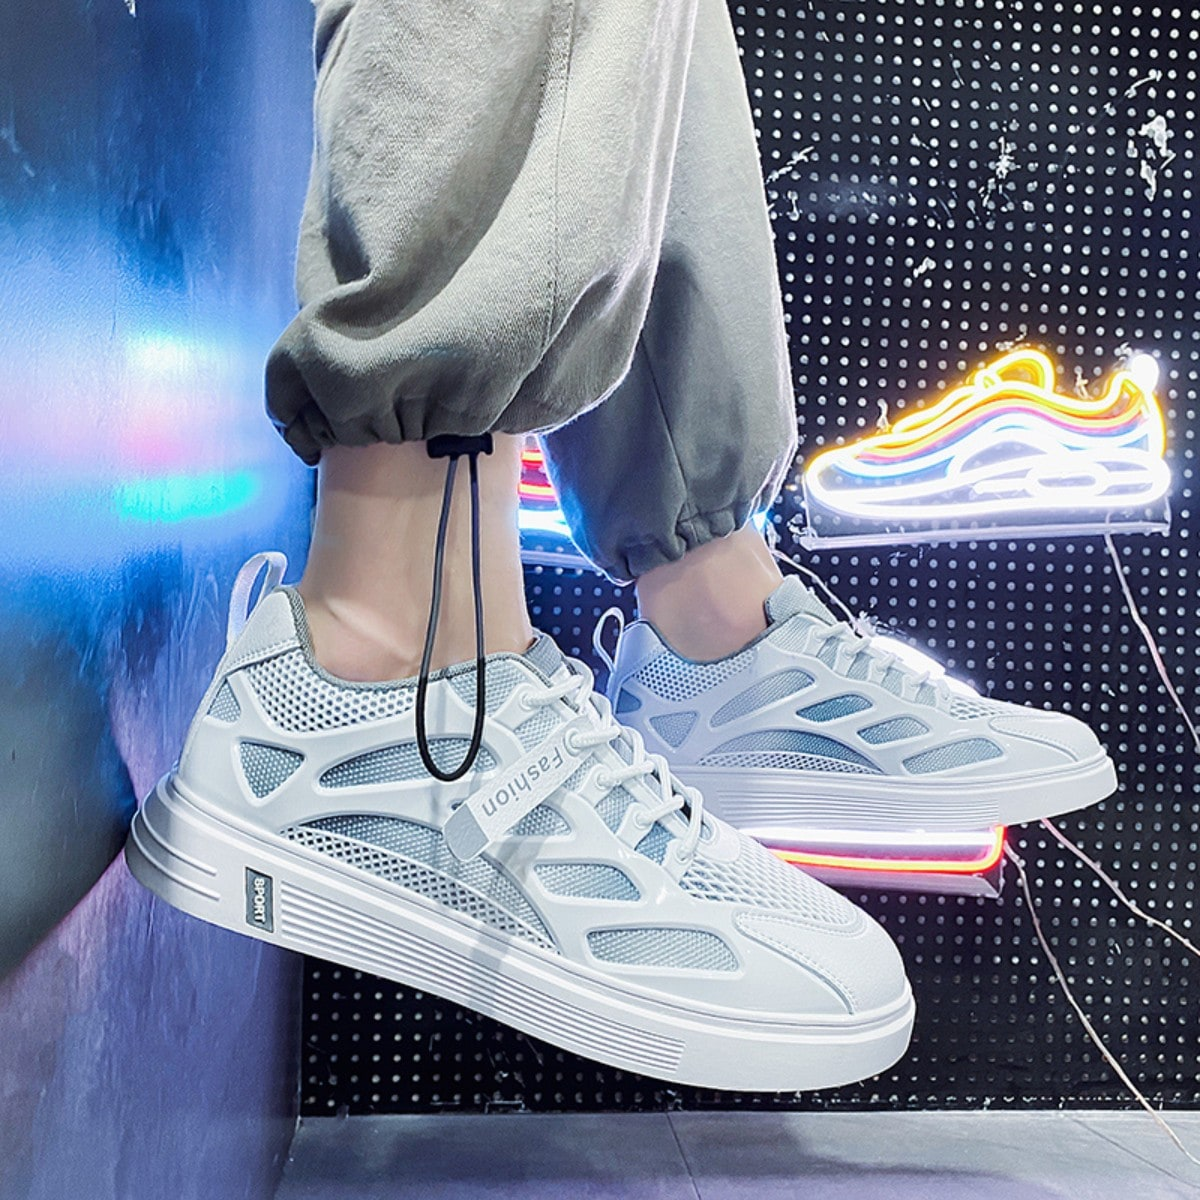 Zapatos deportivos para hombre